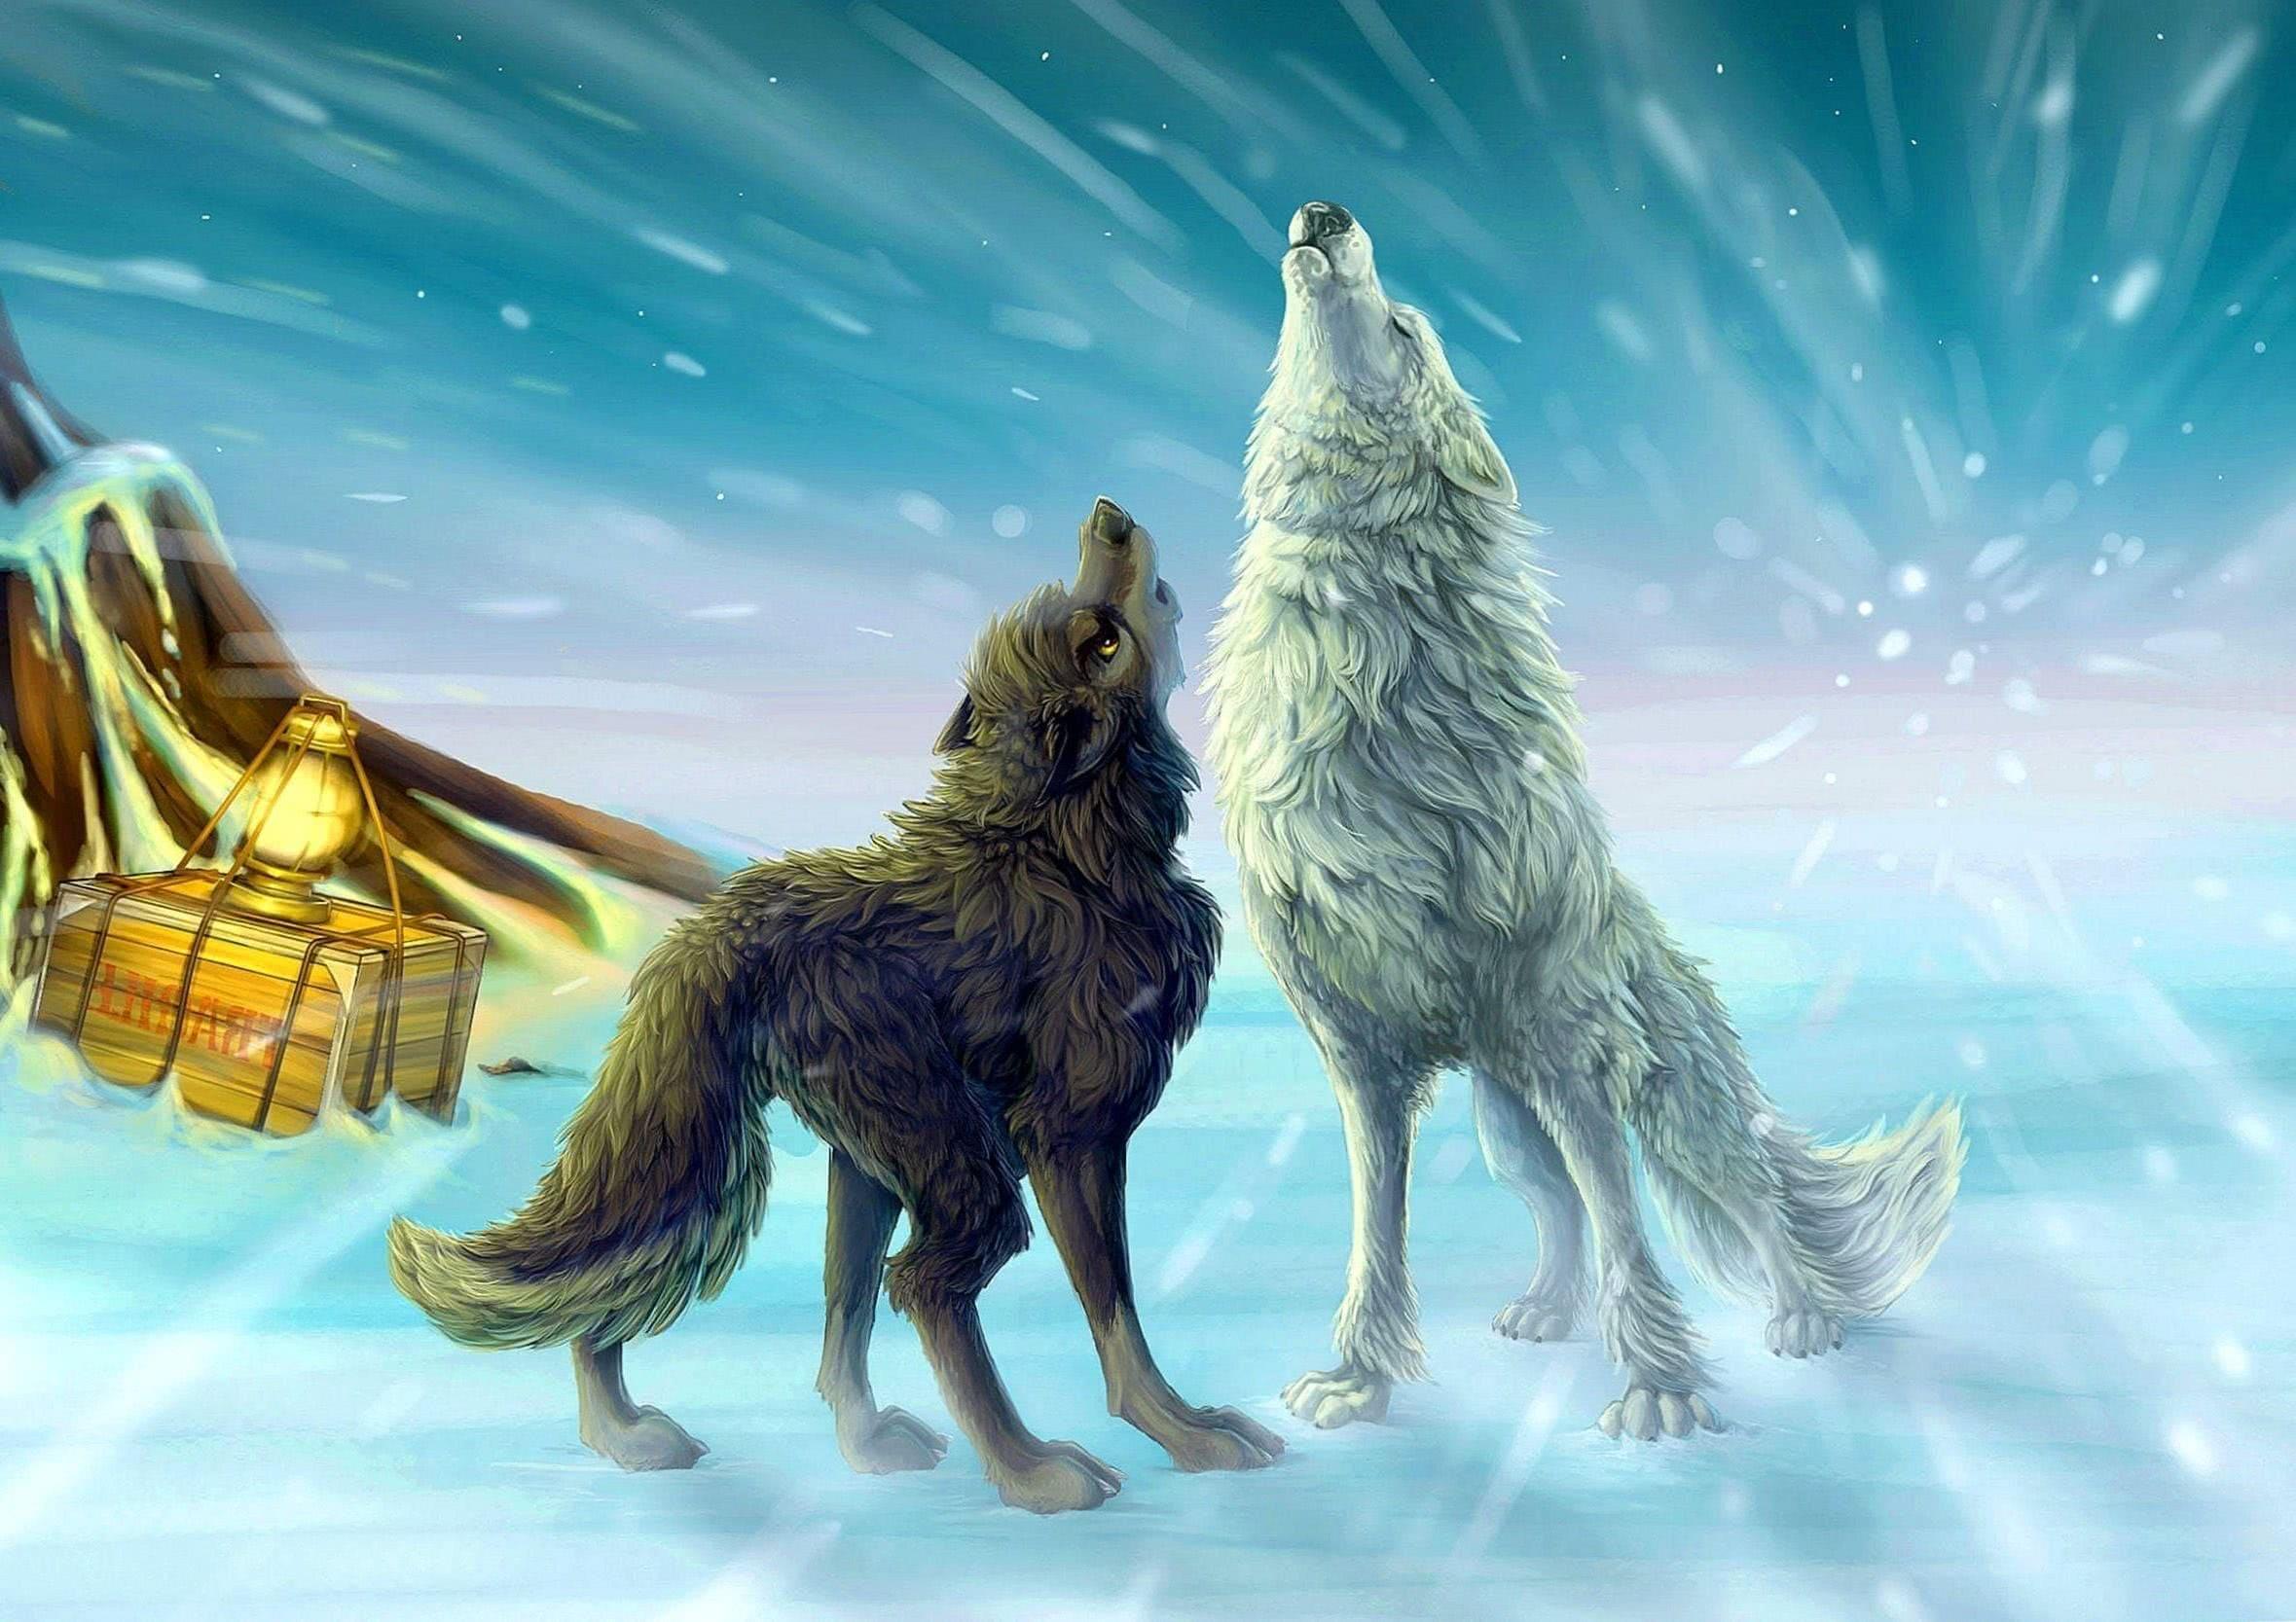 Anime Wolf Wallpaper Full HD